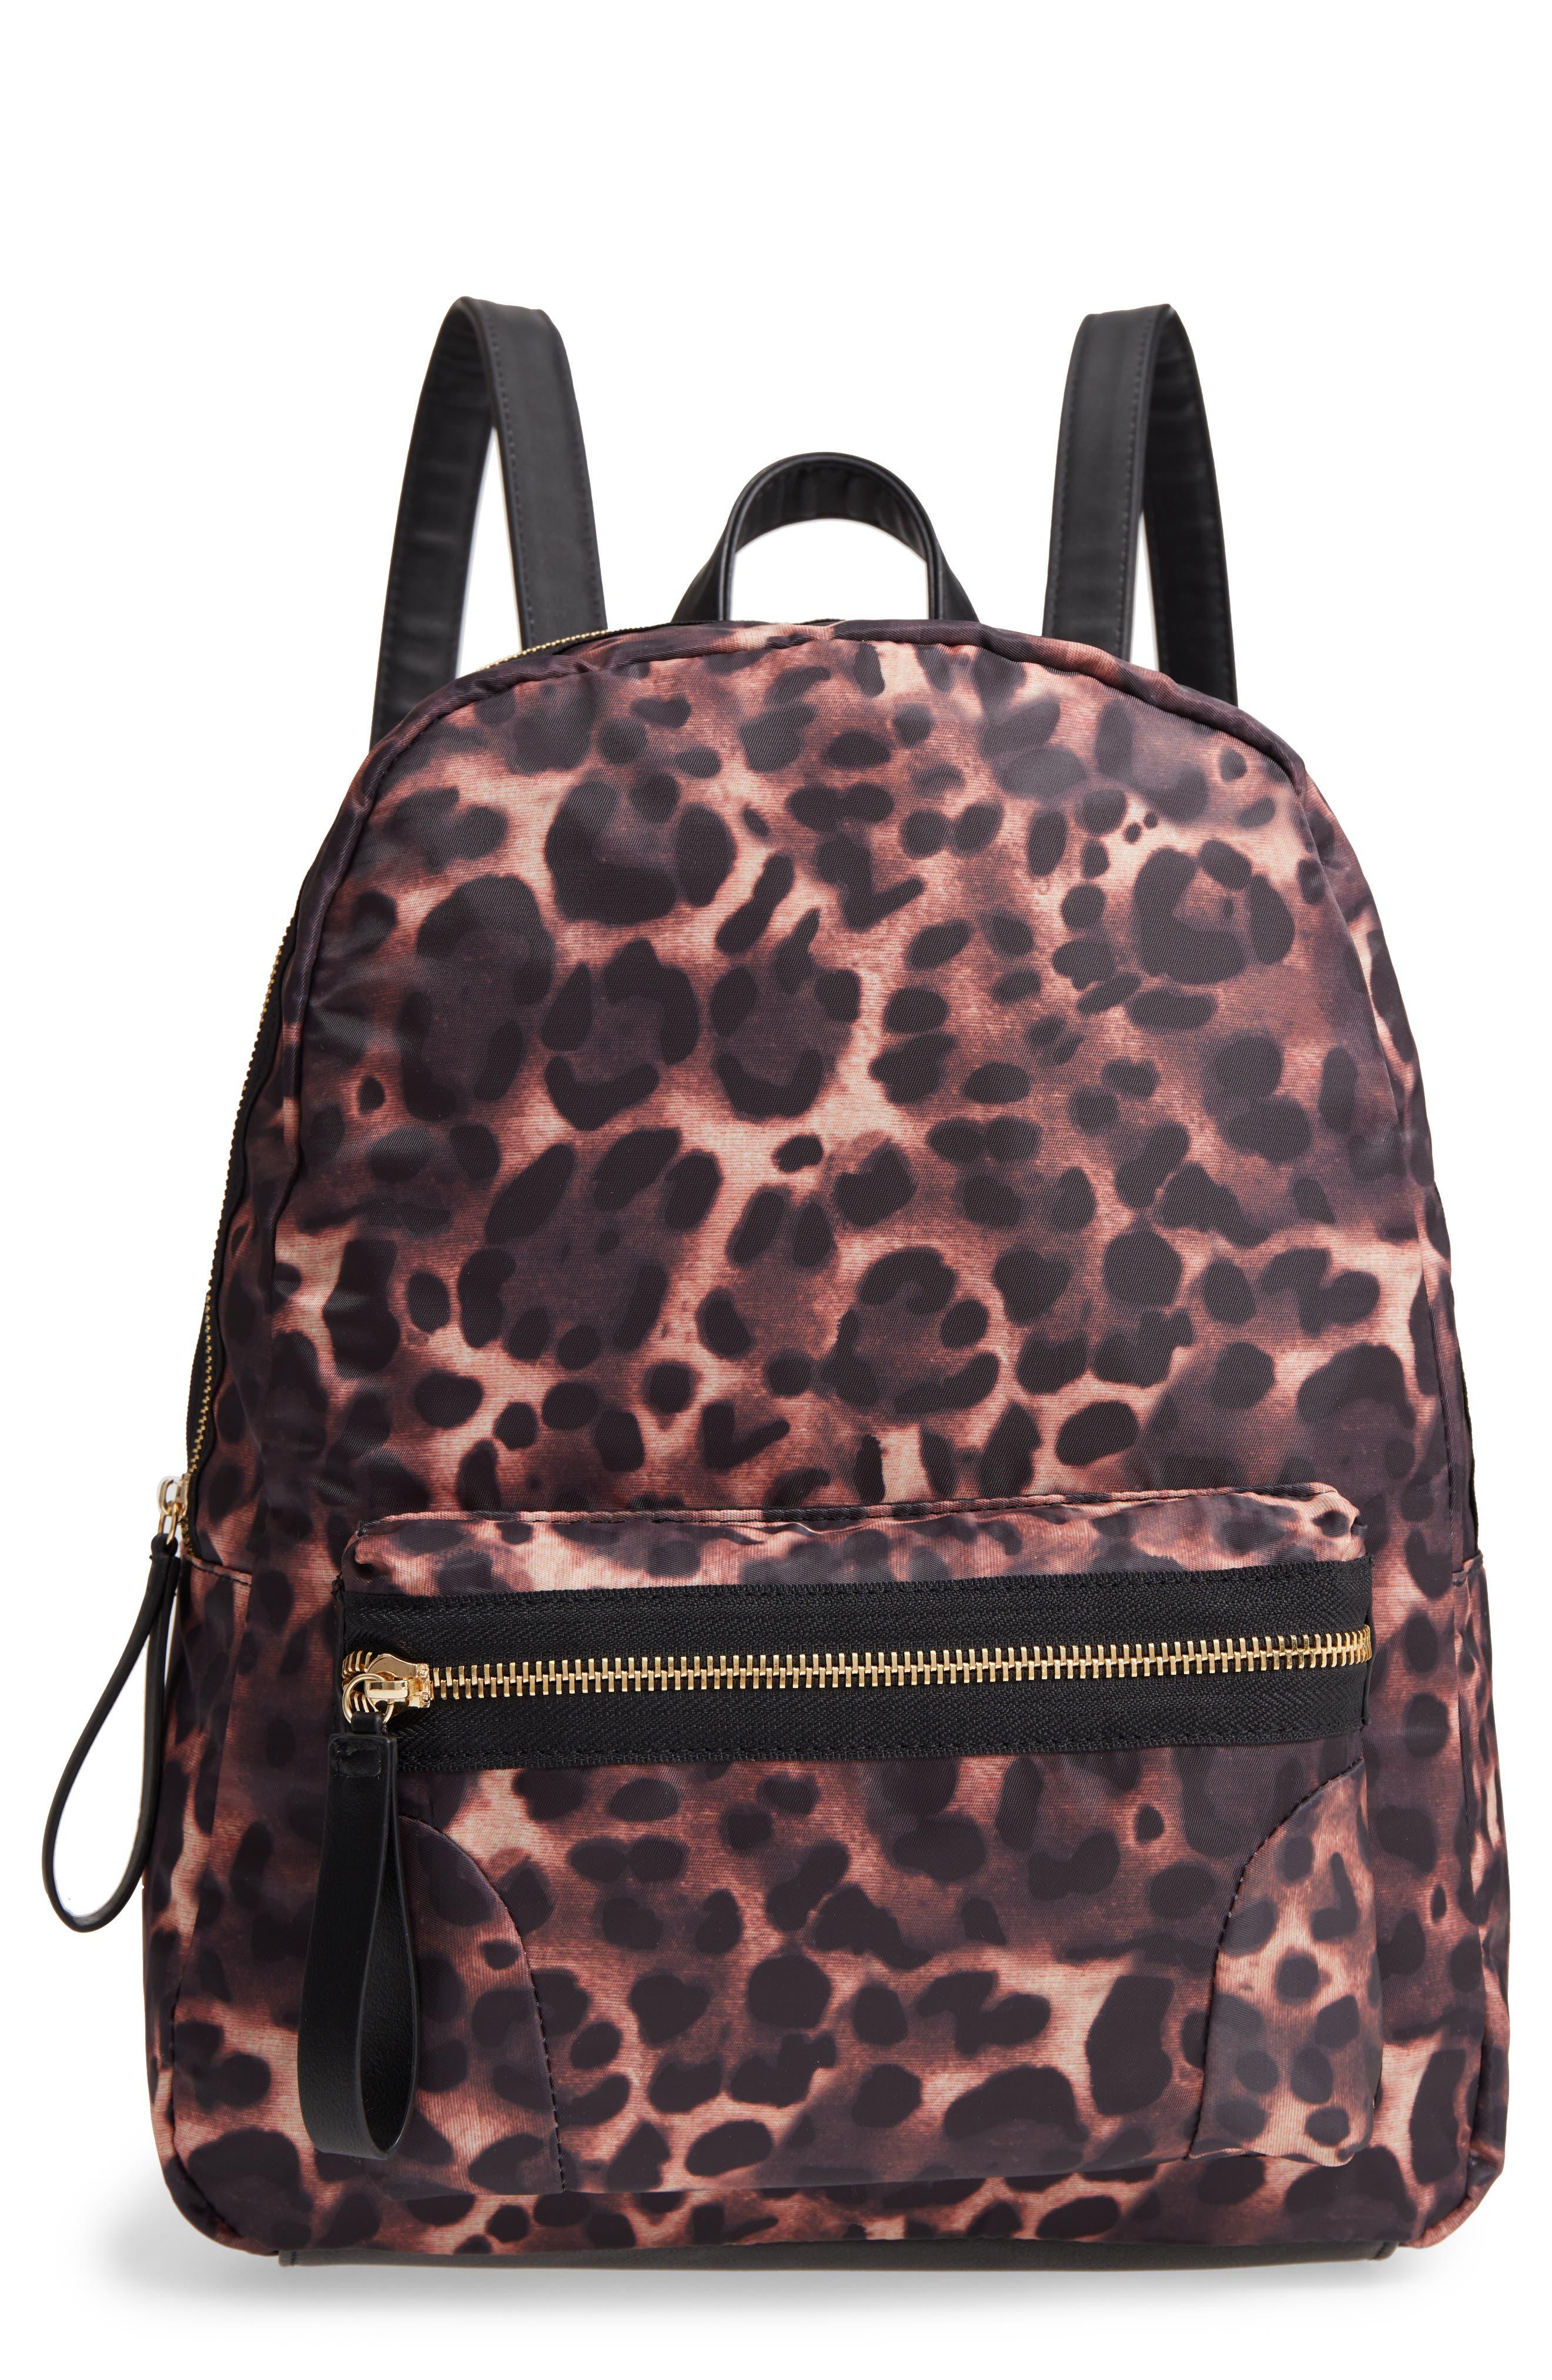 Leopard Print Nylon Backpack,                         Main,                         color, 200